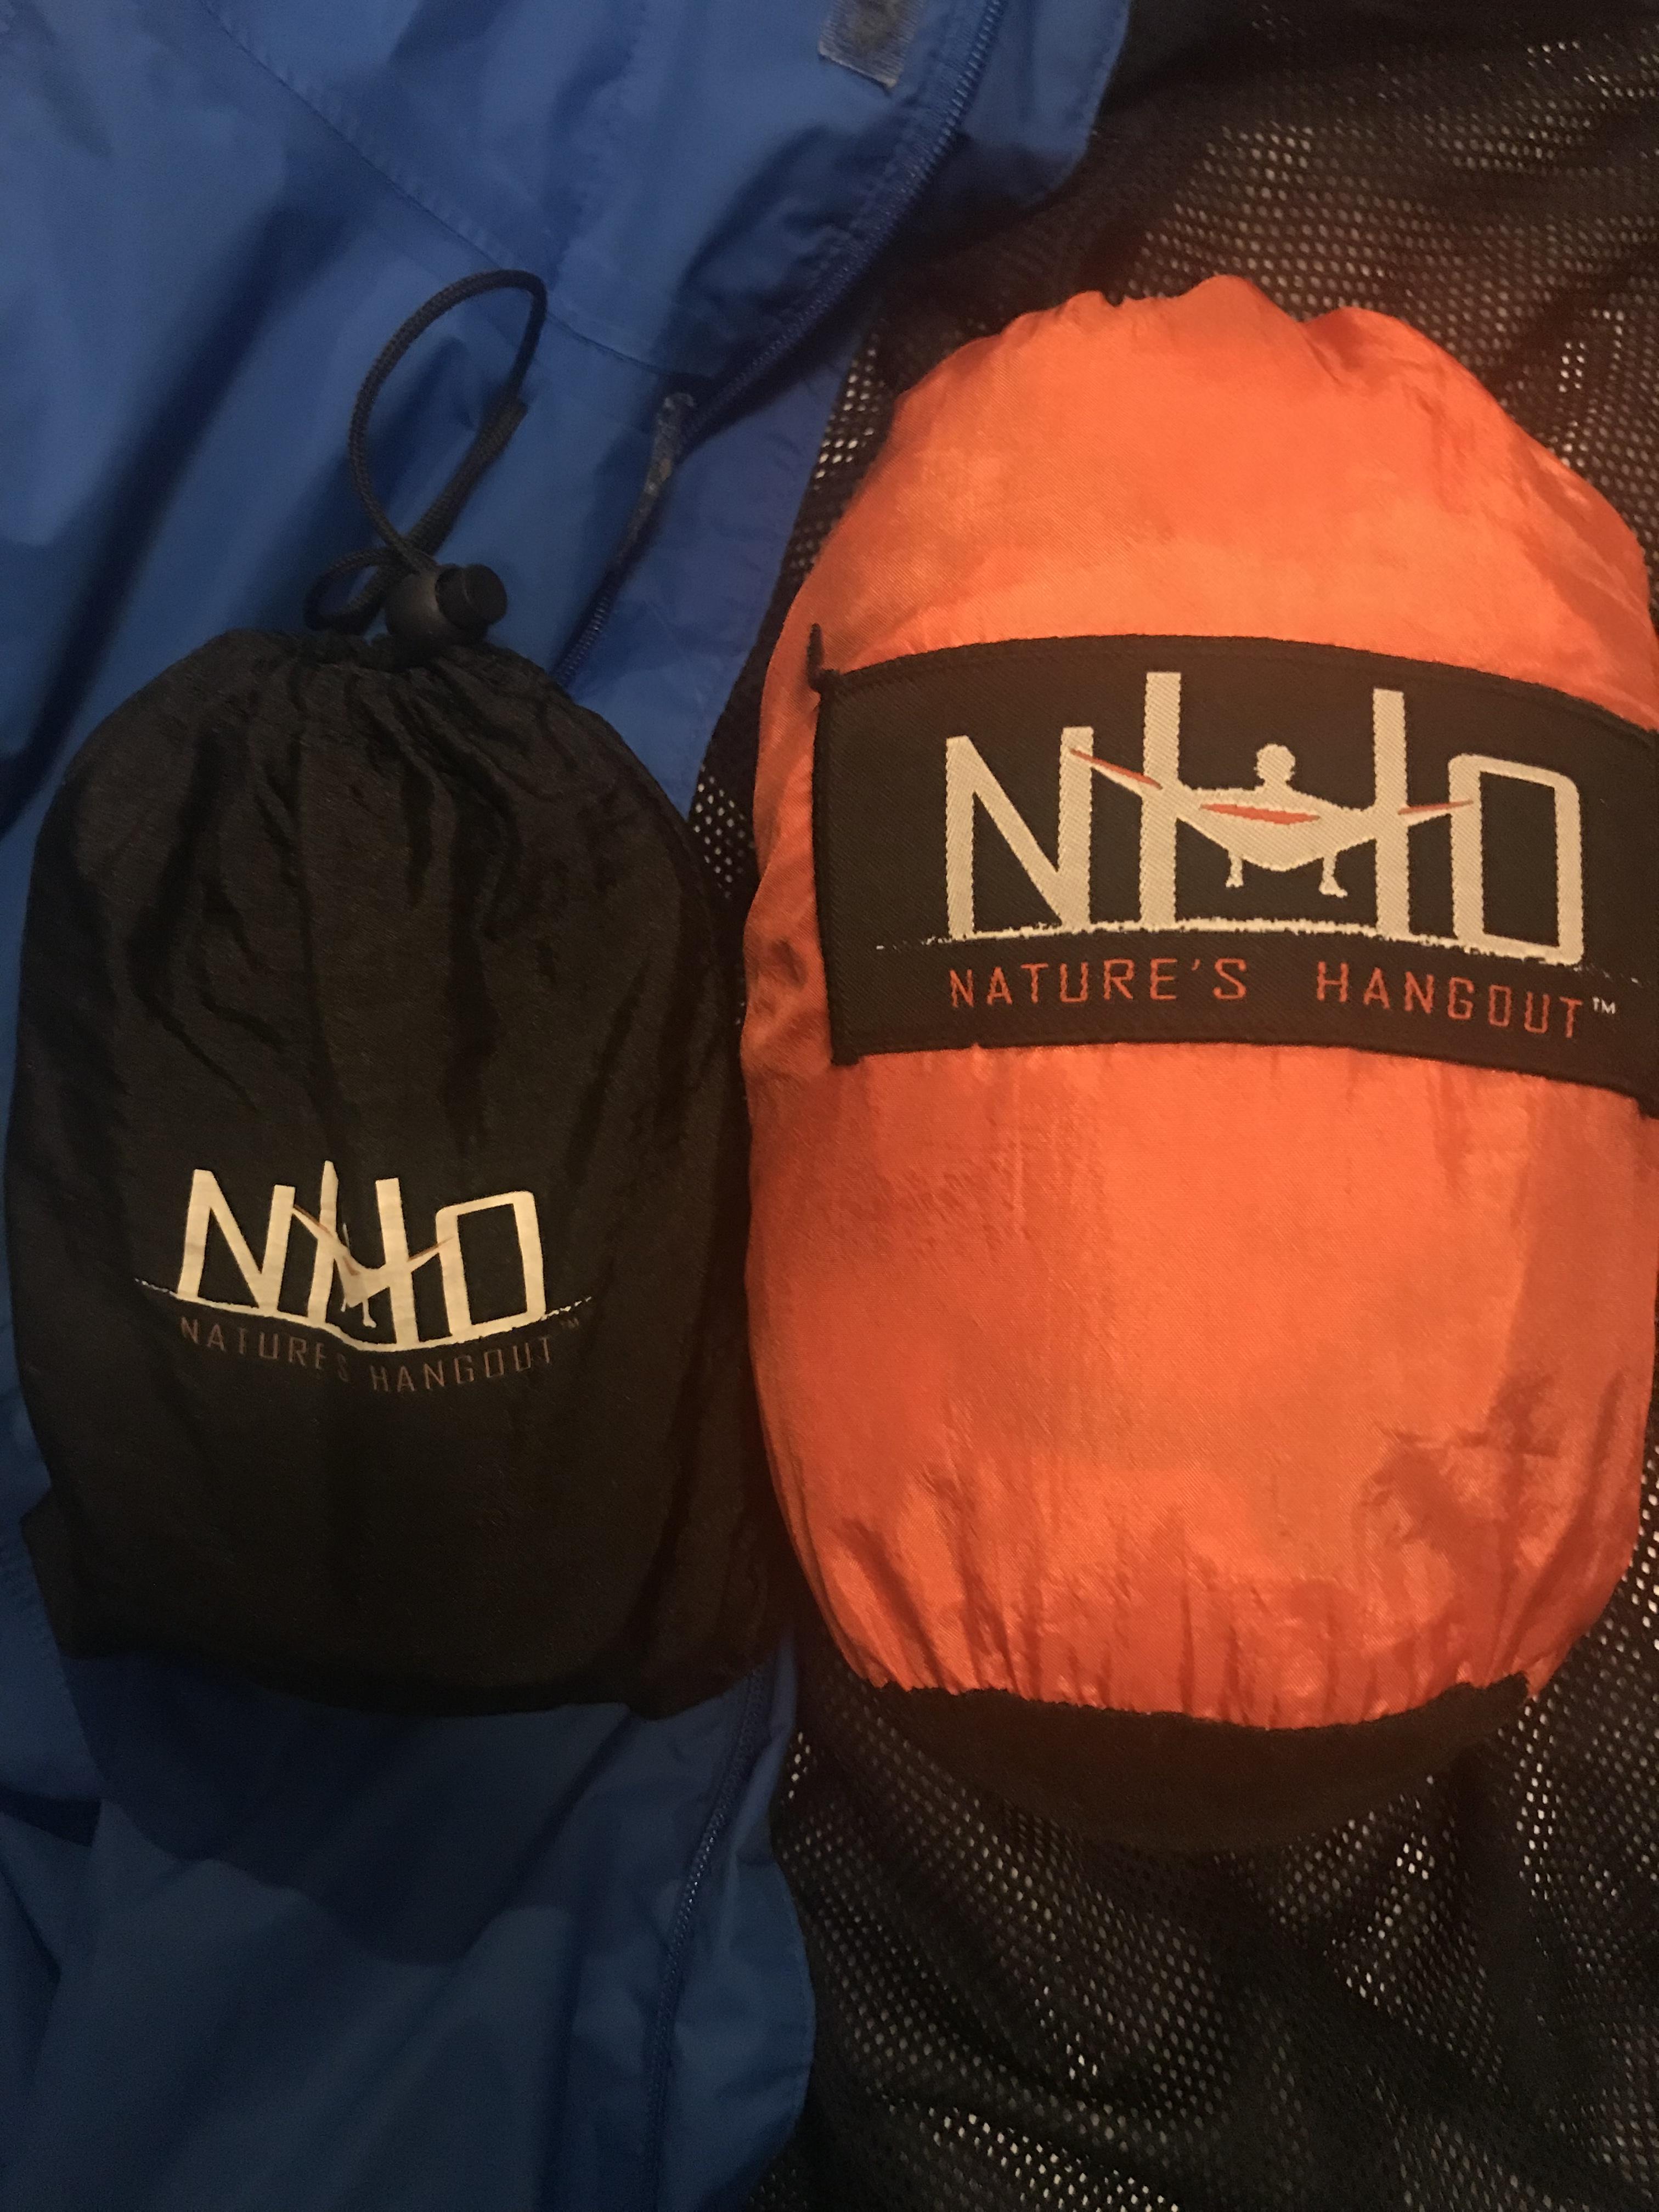 Nature's Hangout DoubleHang Camping Hammock